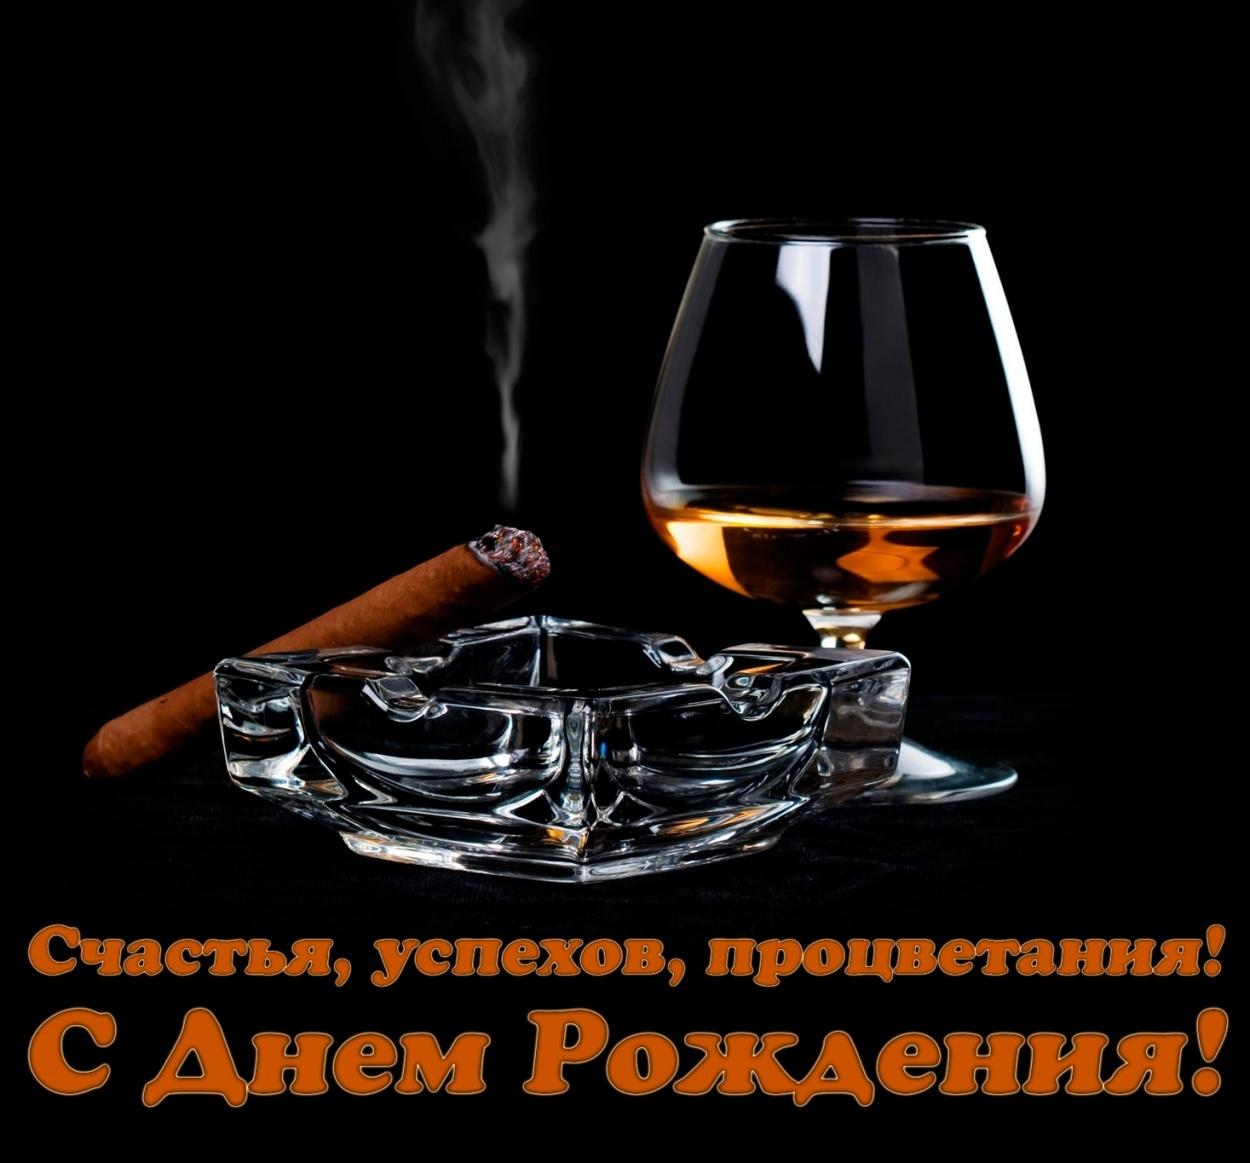 Изображение стороннего сайта - http://proactions.ru/media/uploads/2017/01/01/jv03bhiq.jpg